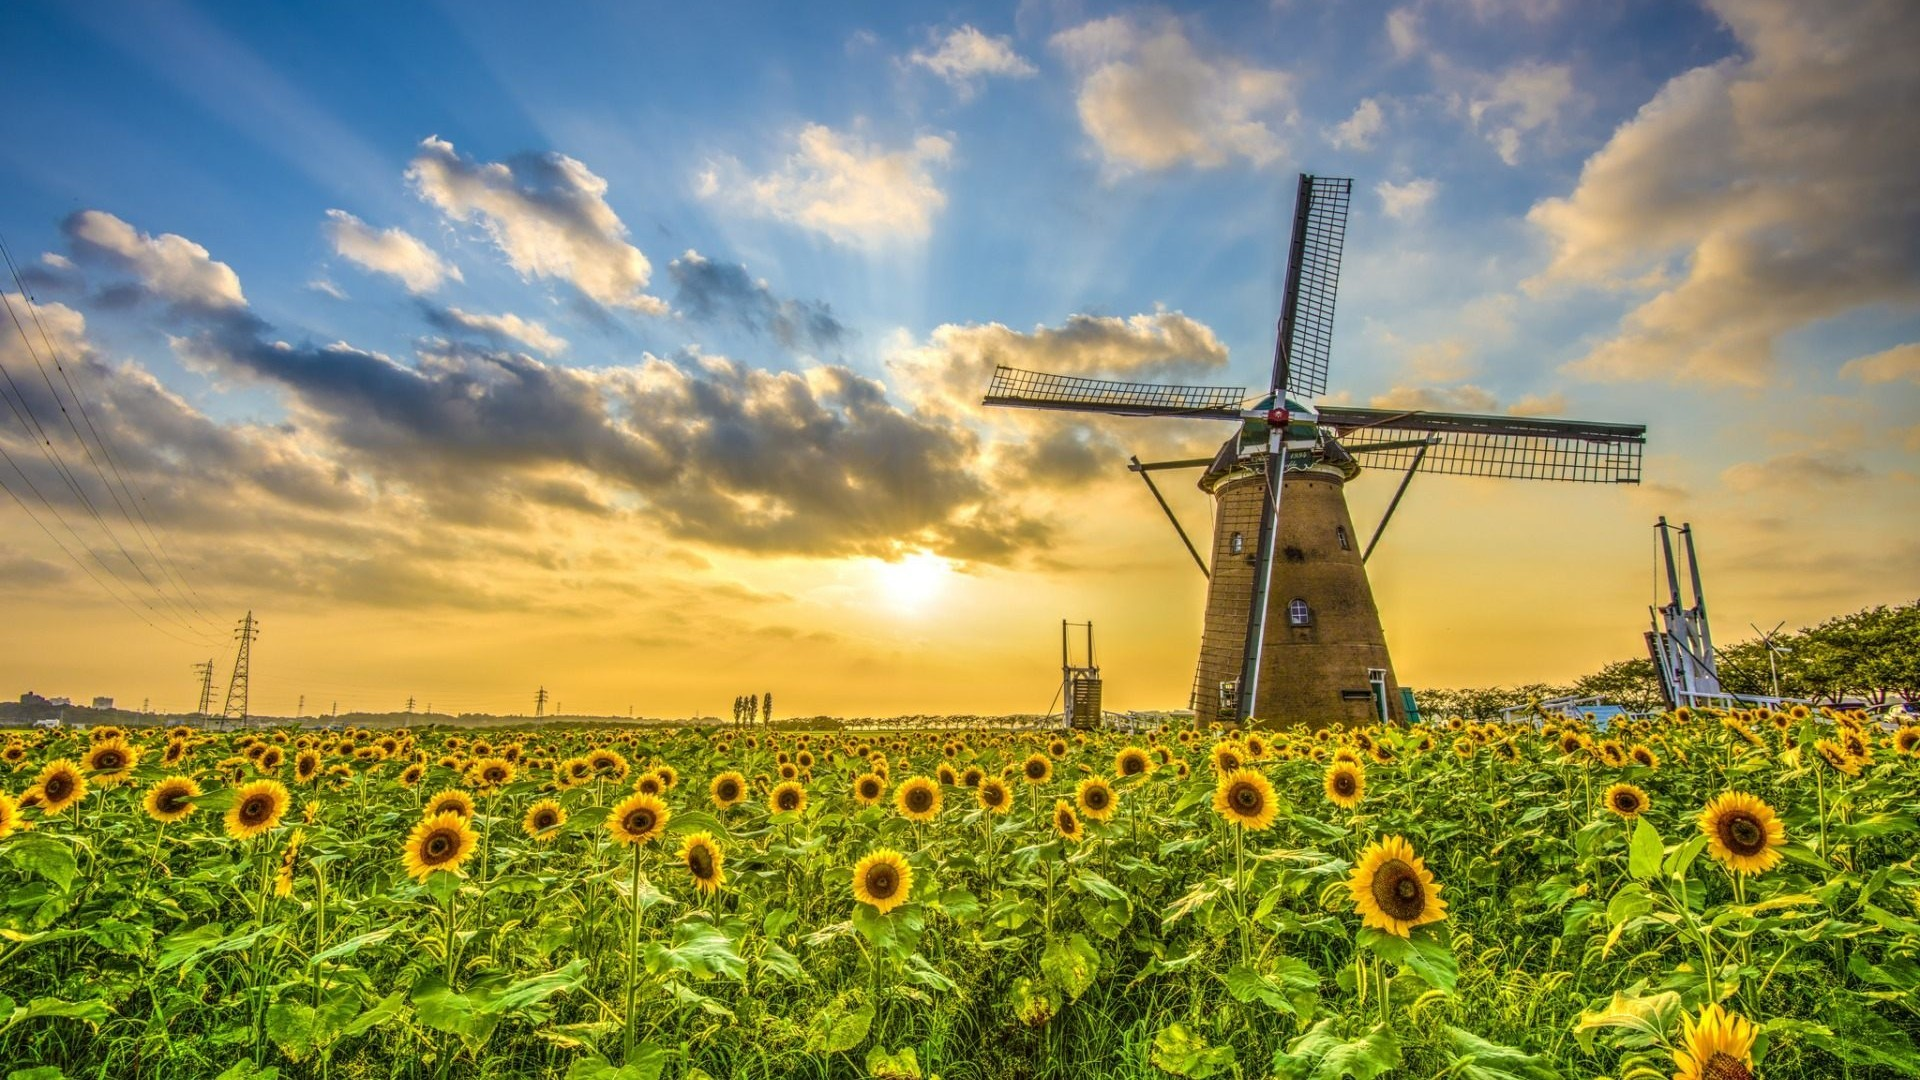 Windmill Farms Sunflower Field Wallpaper